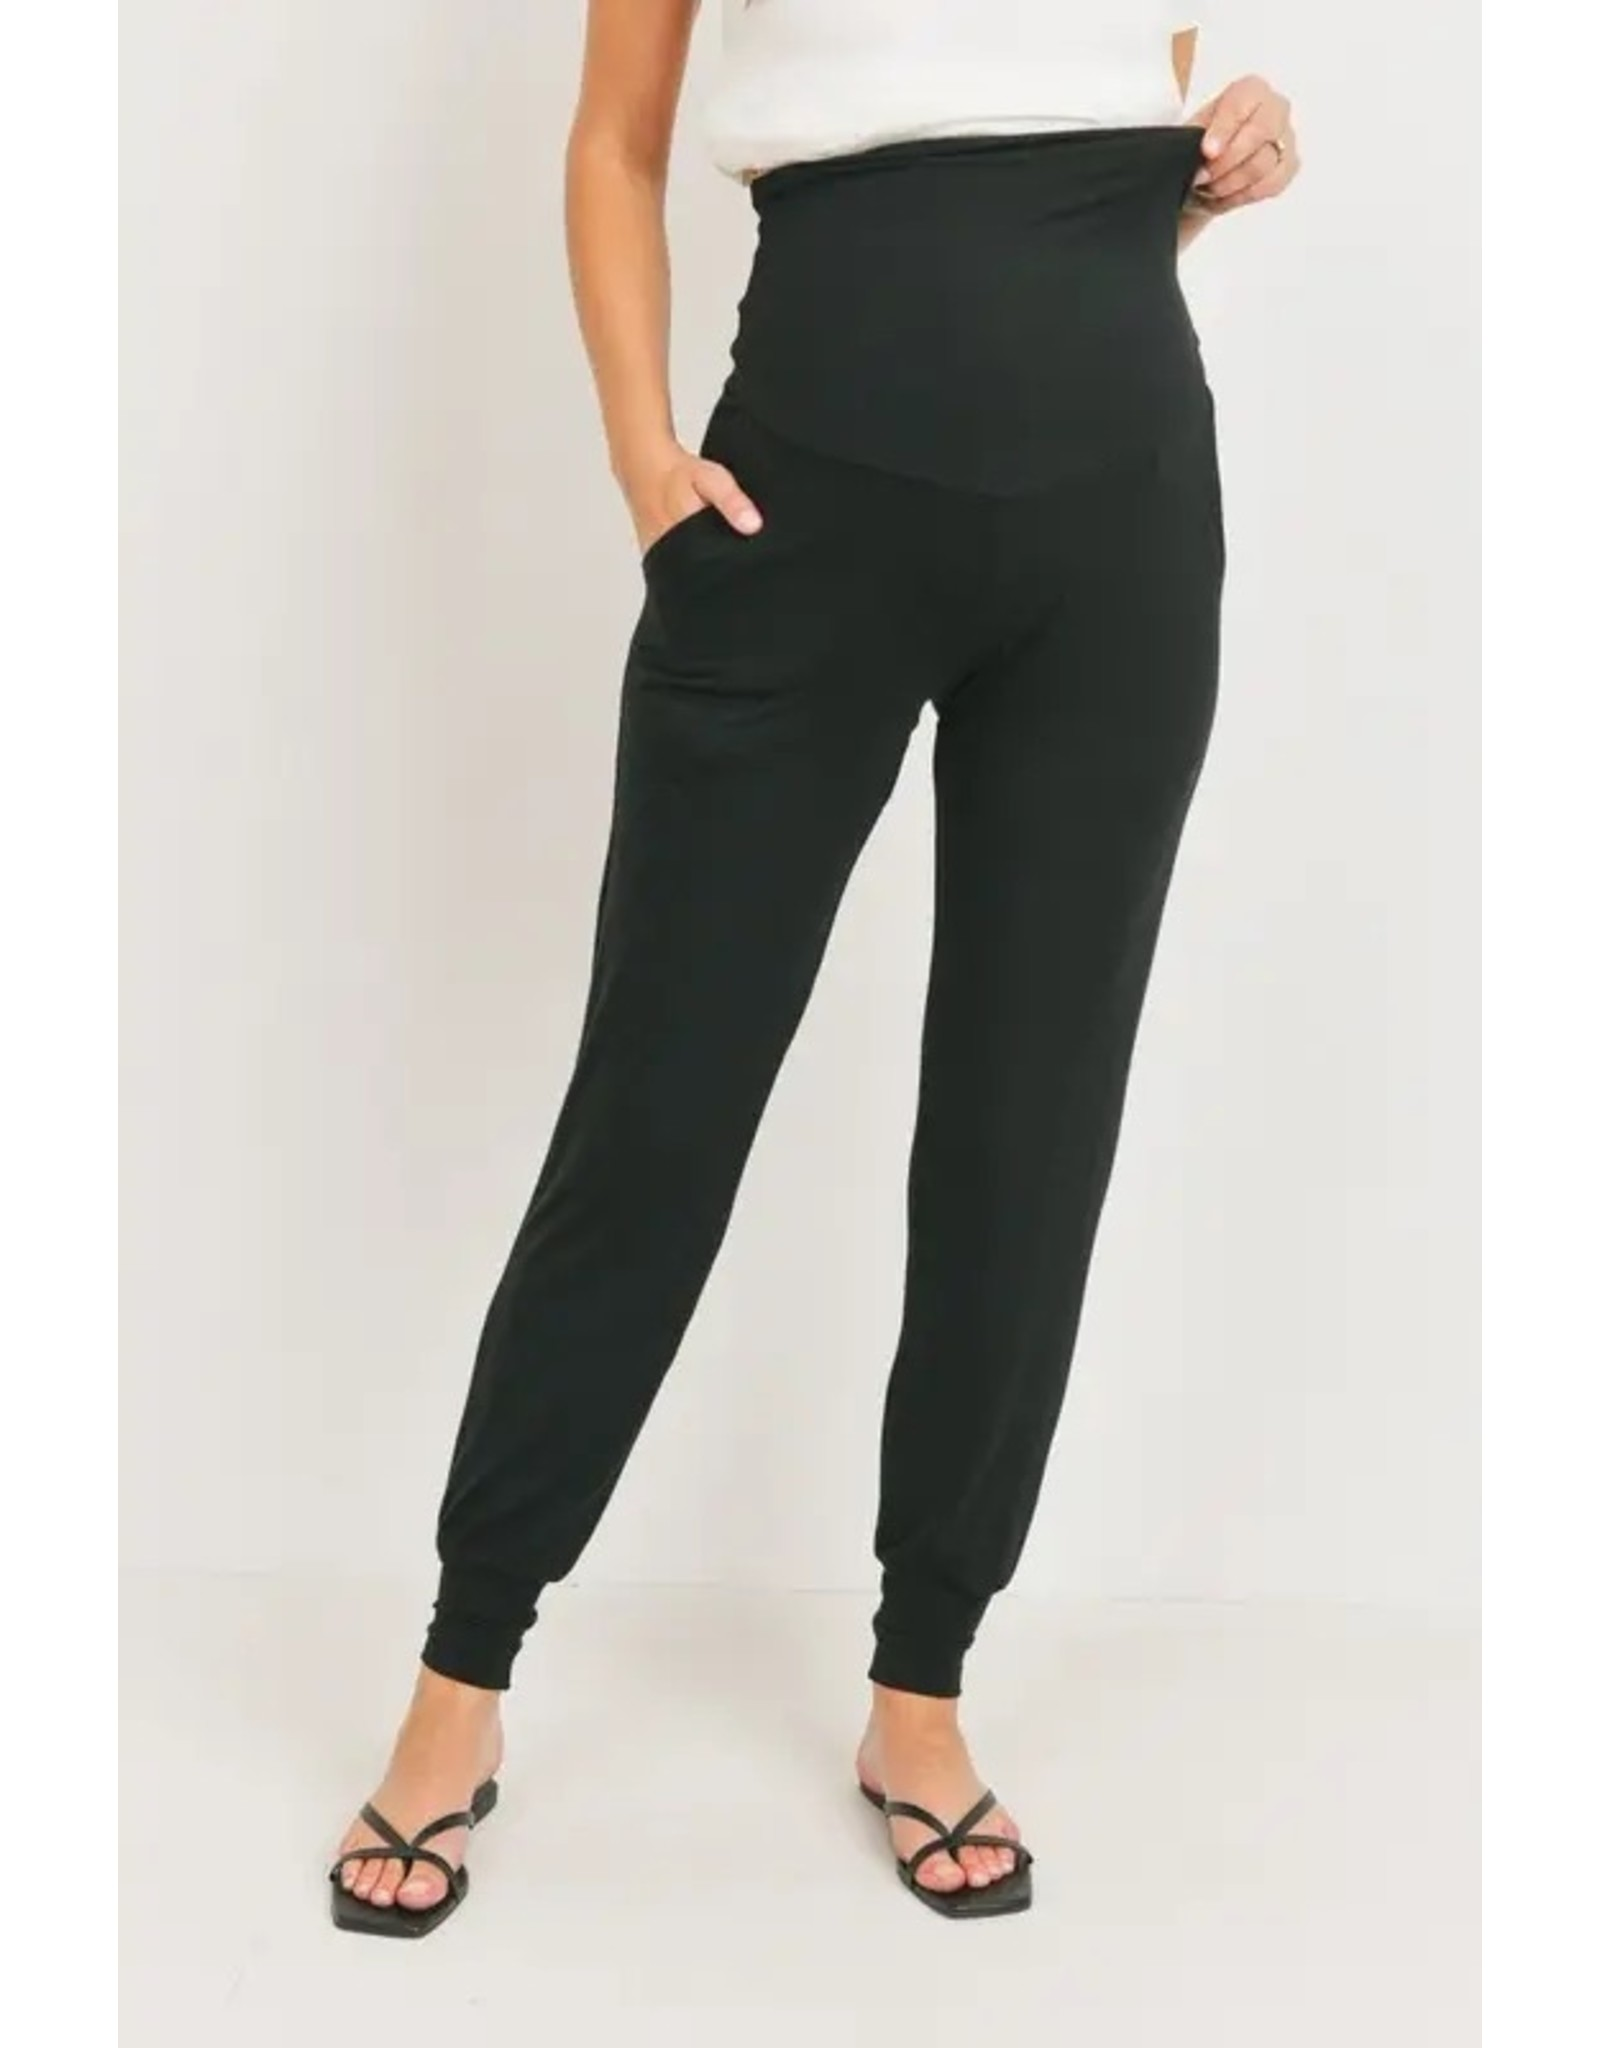 Ashley Nicole, Maternity Waistband Jogger Pant With Pockets, Black